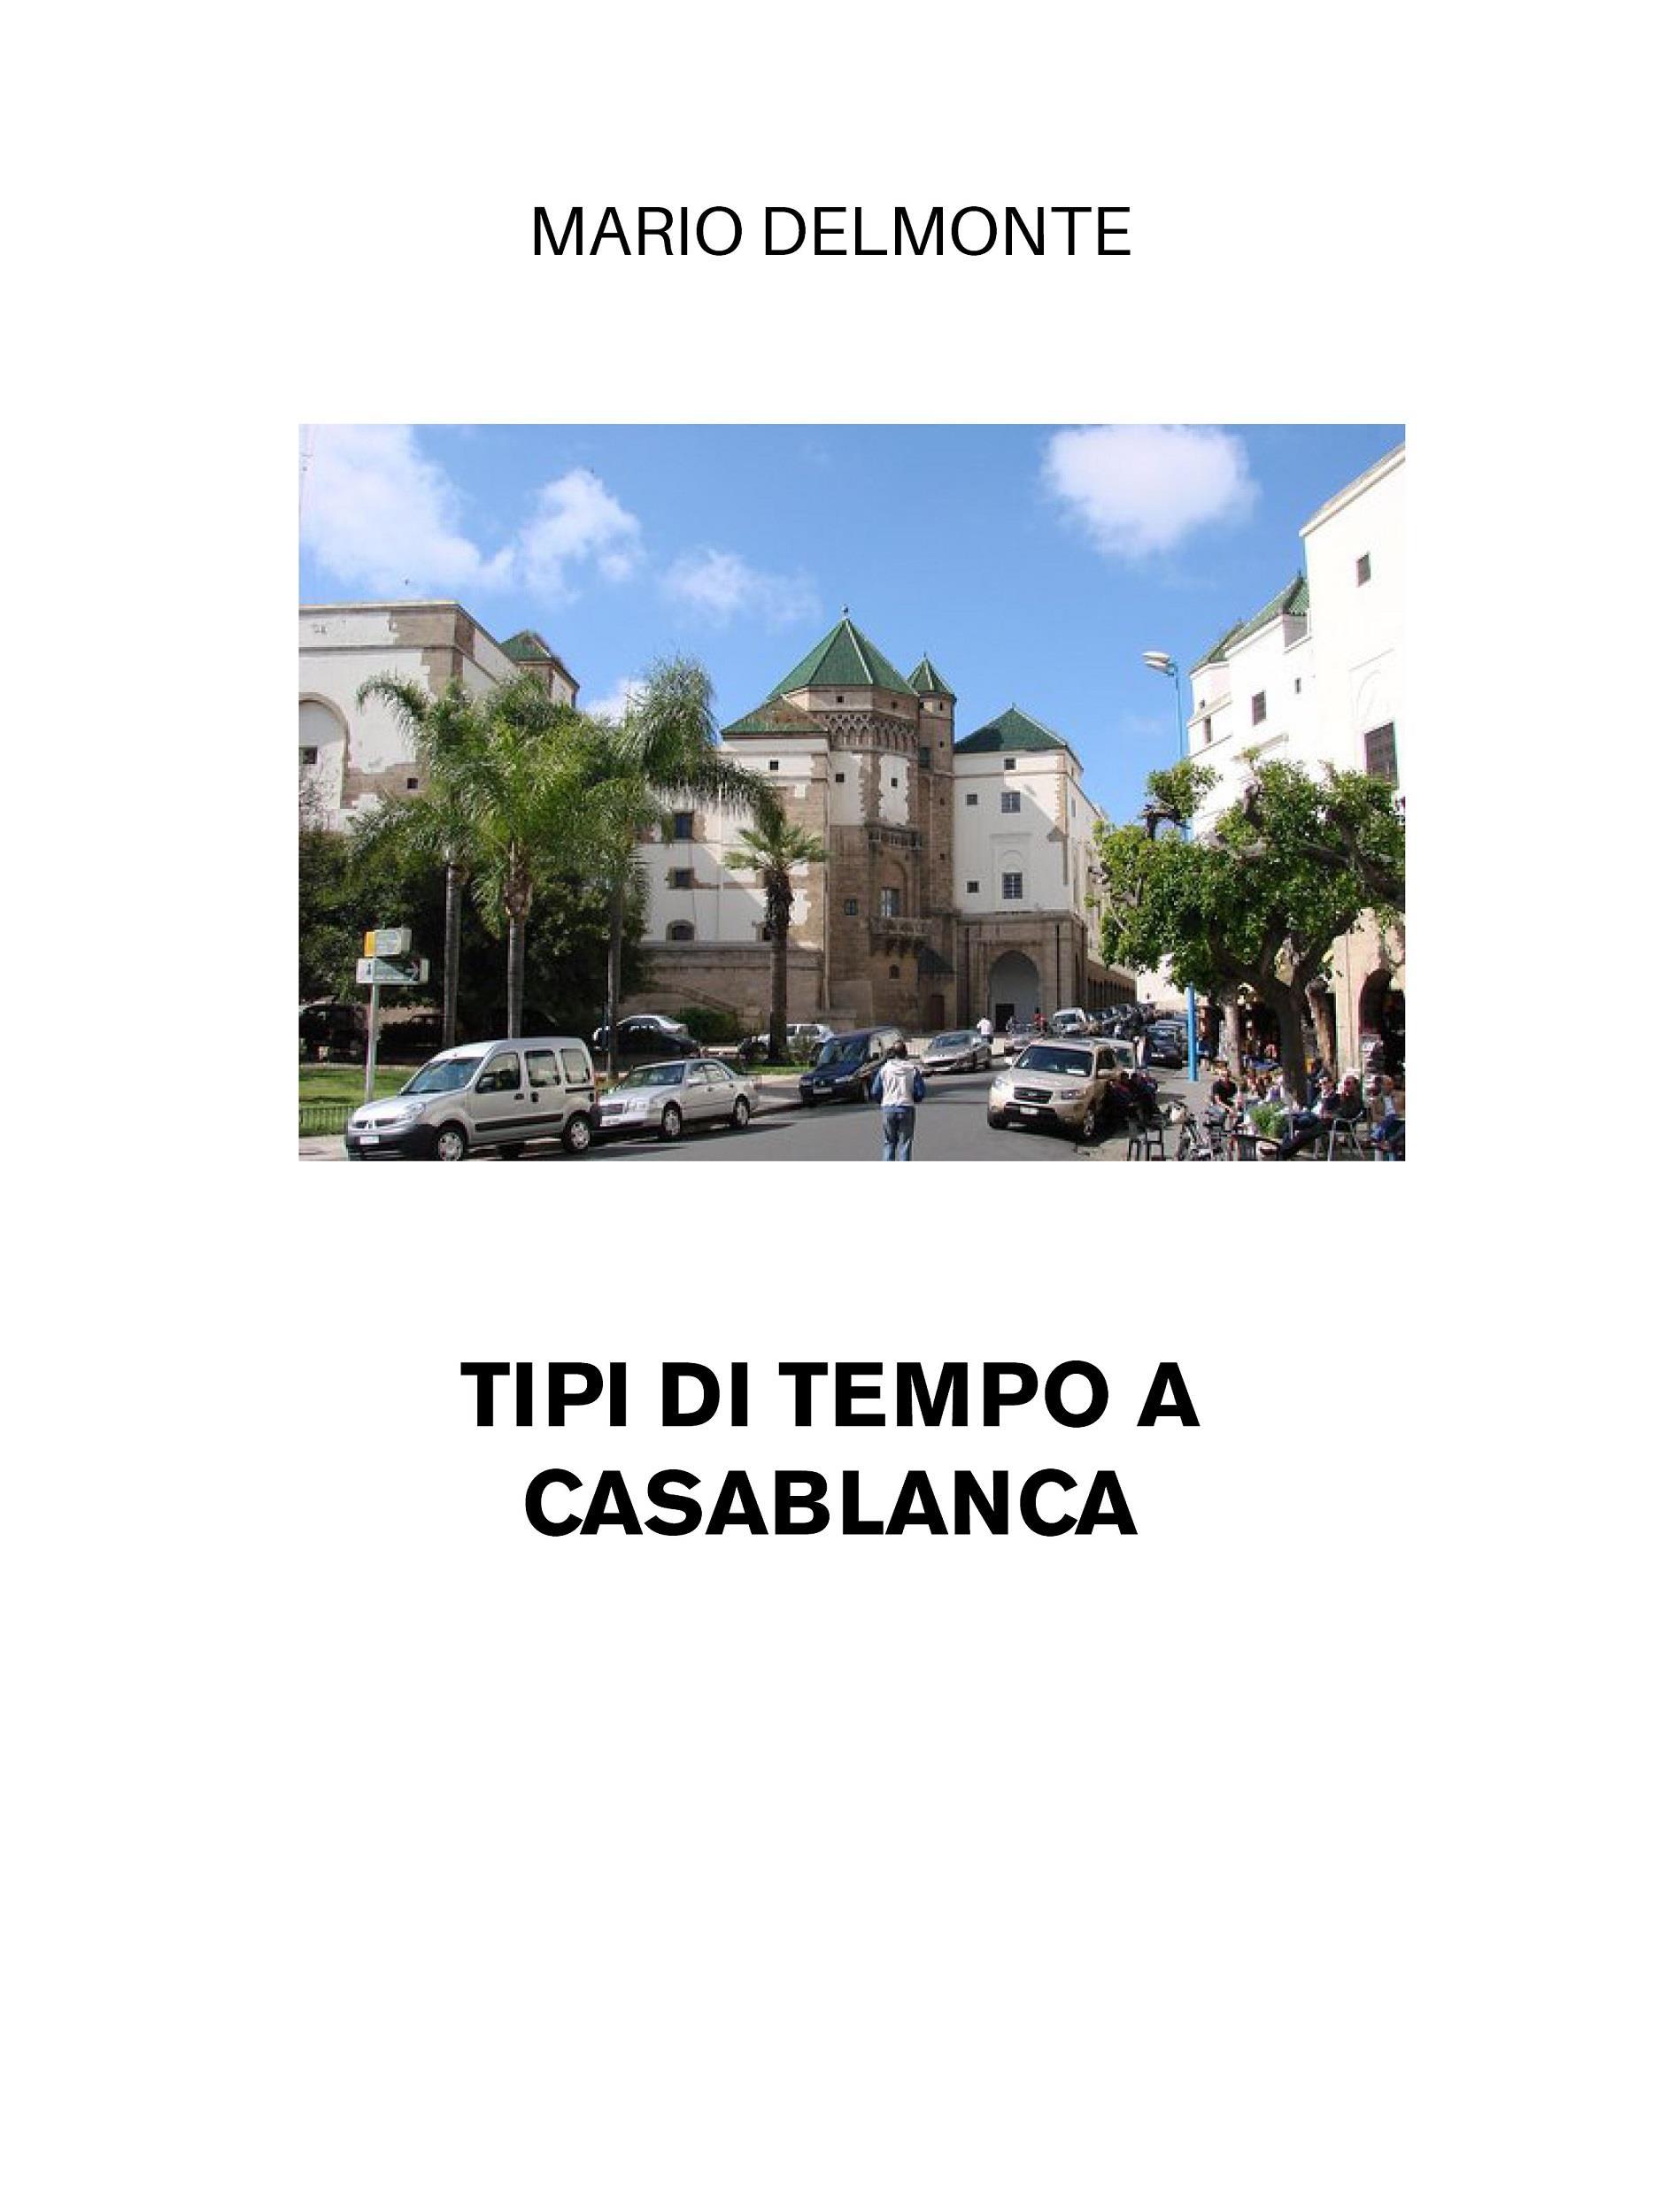 Tipi Di Tempo A Casablanca